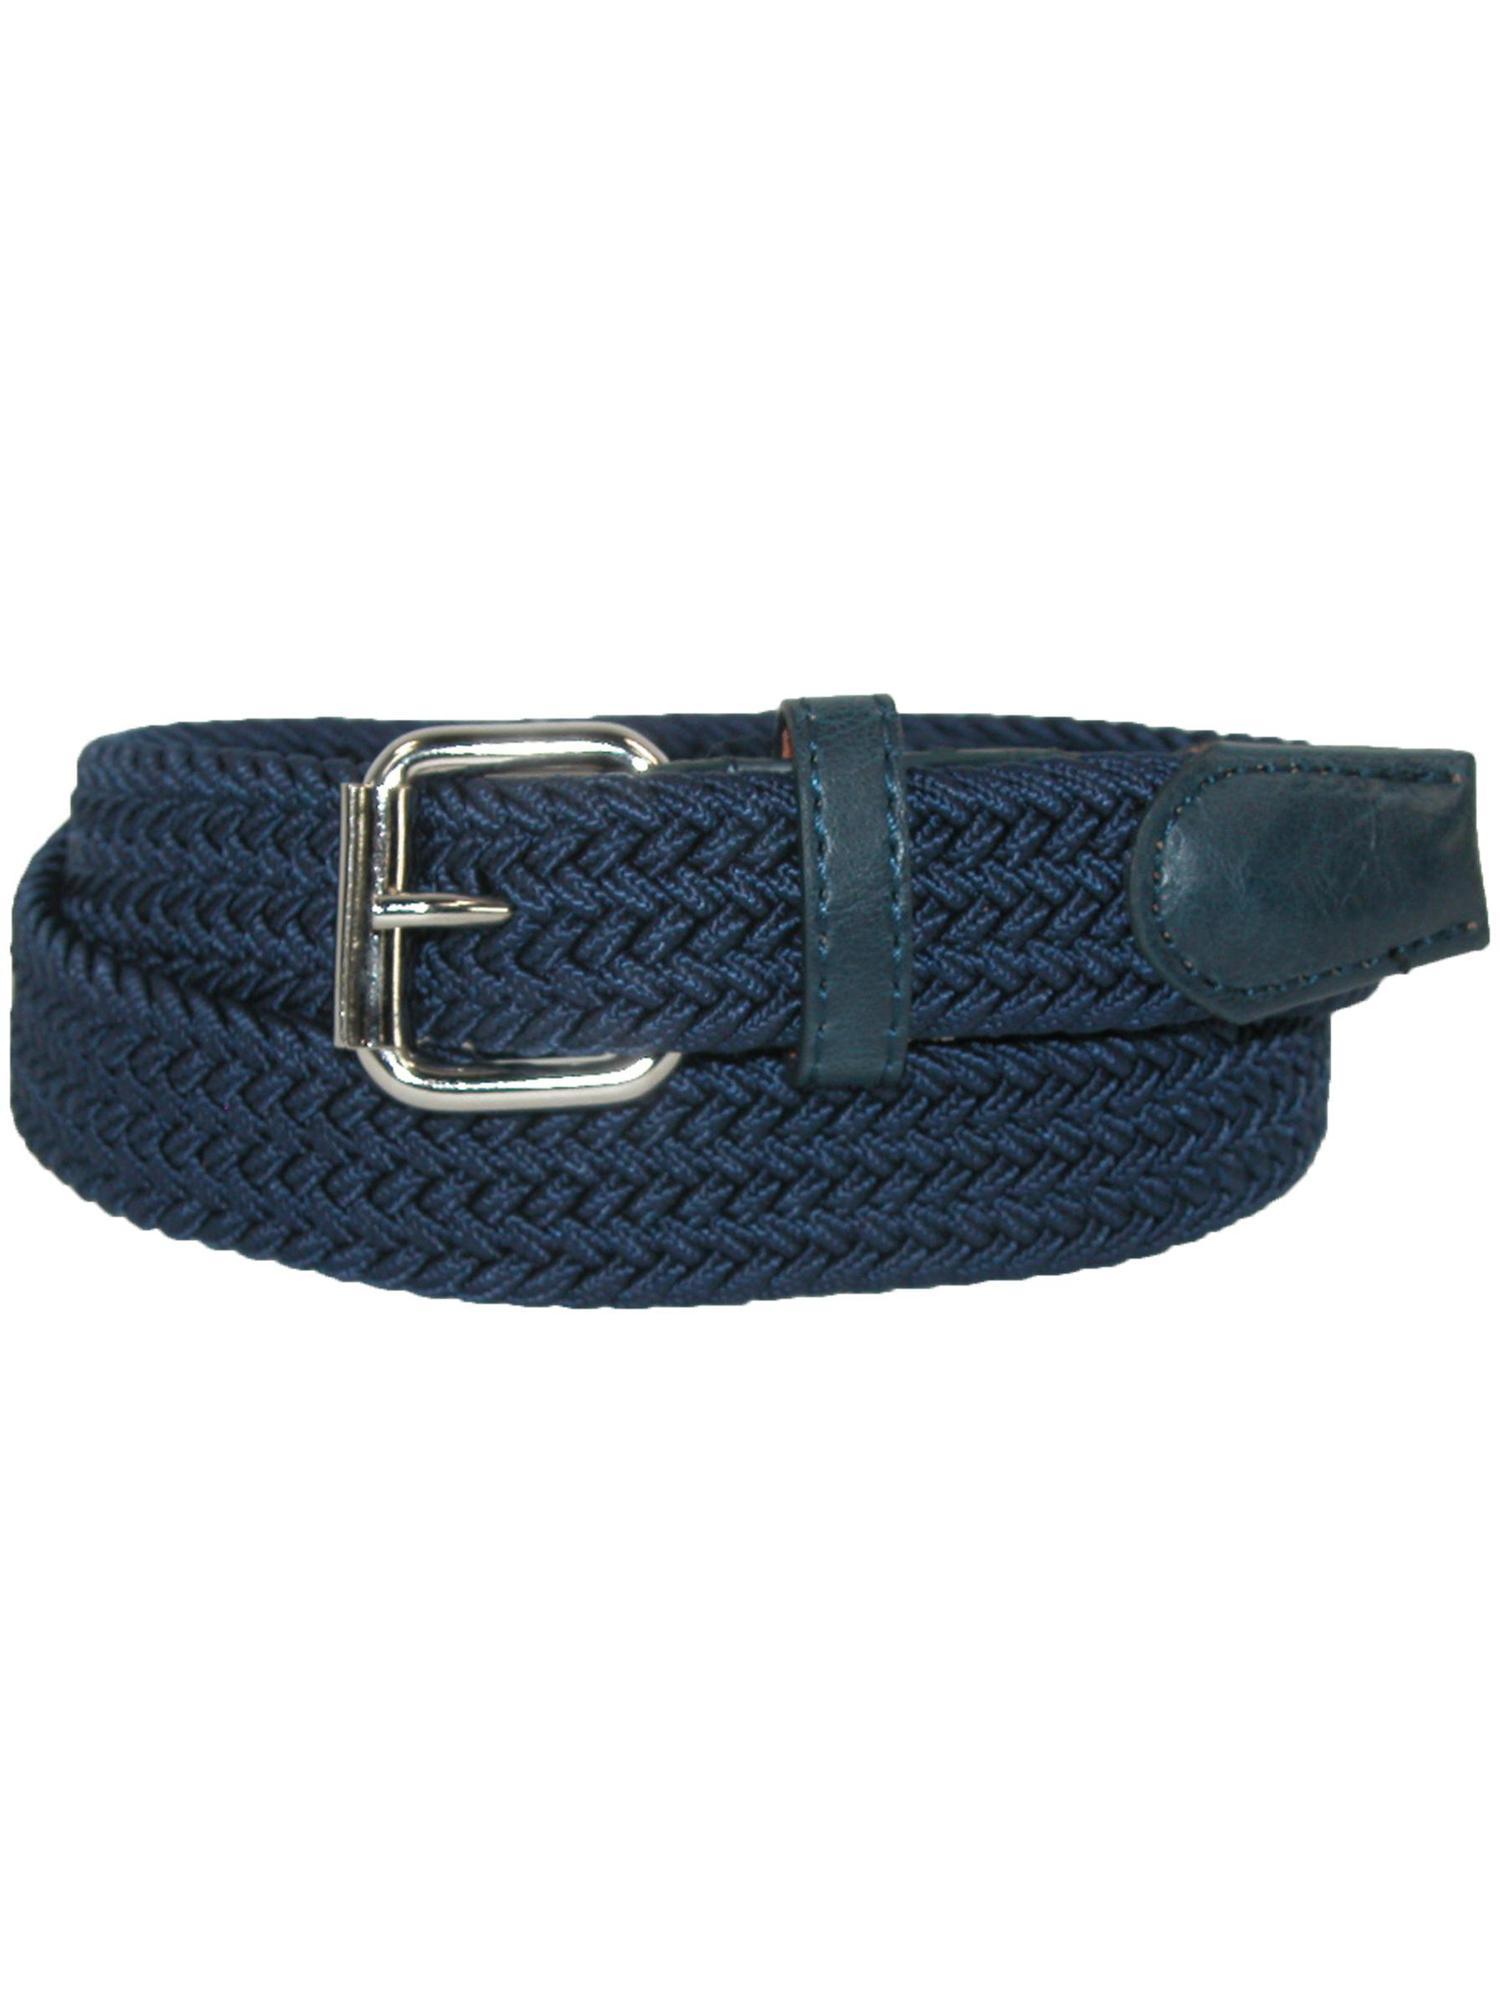 Kid's Elastic Braided Stretch Belt